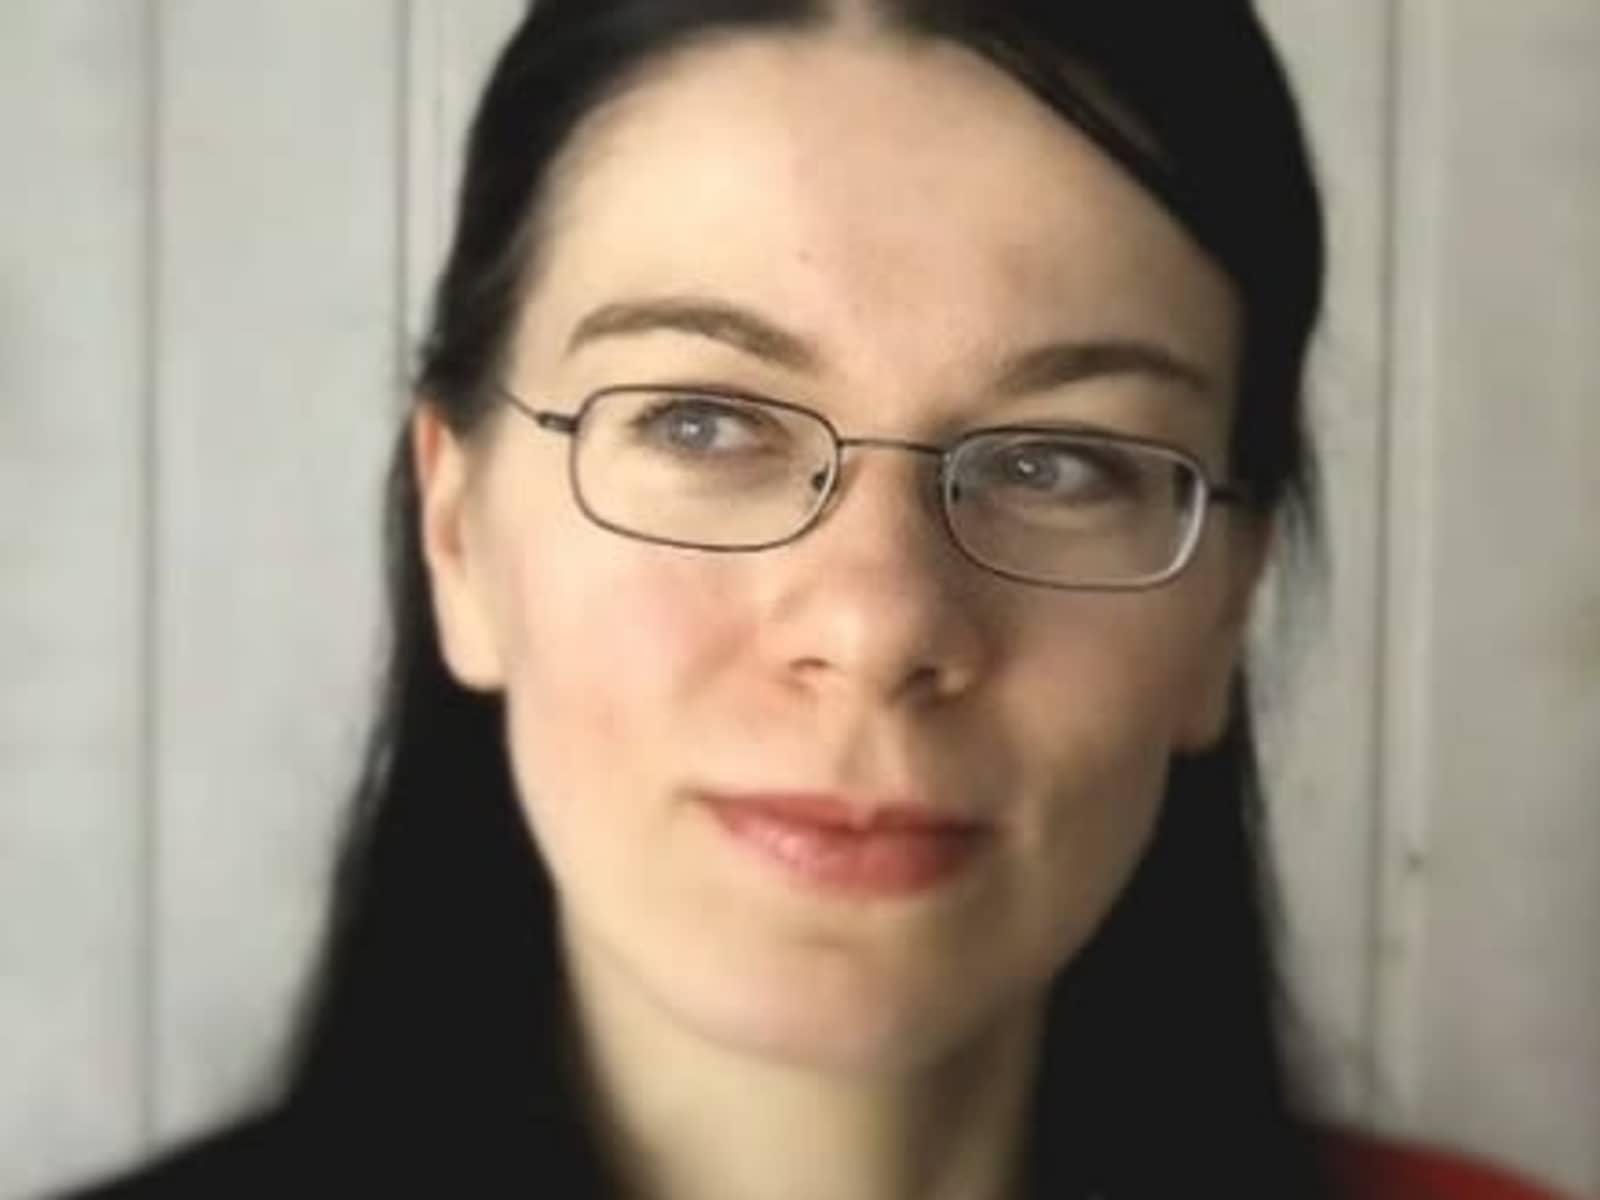 Birgit from Regensburg, Germany